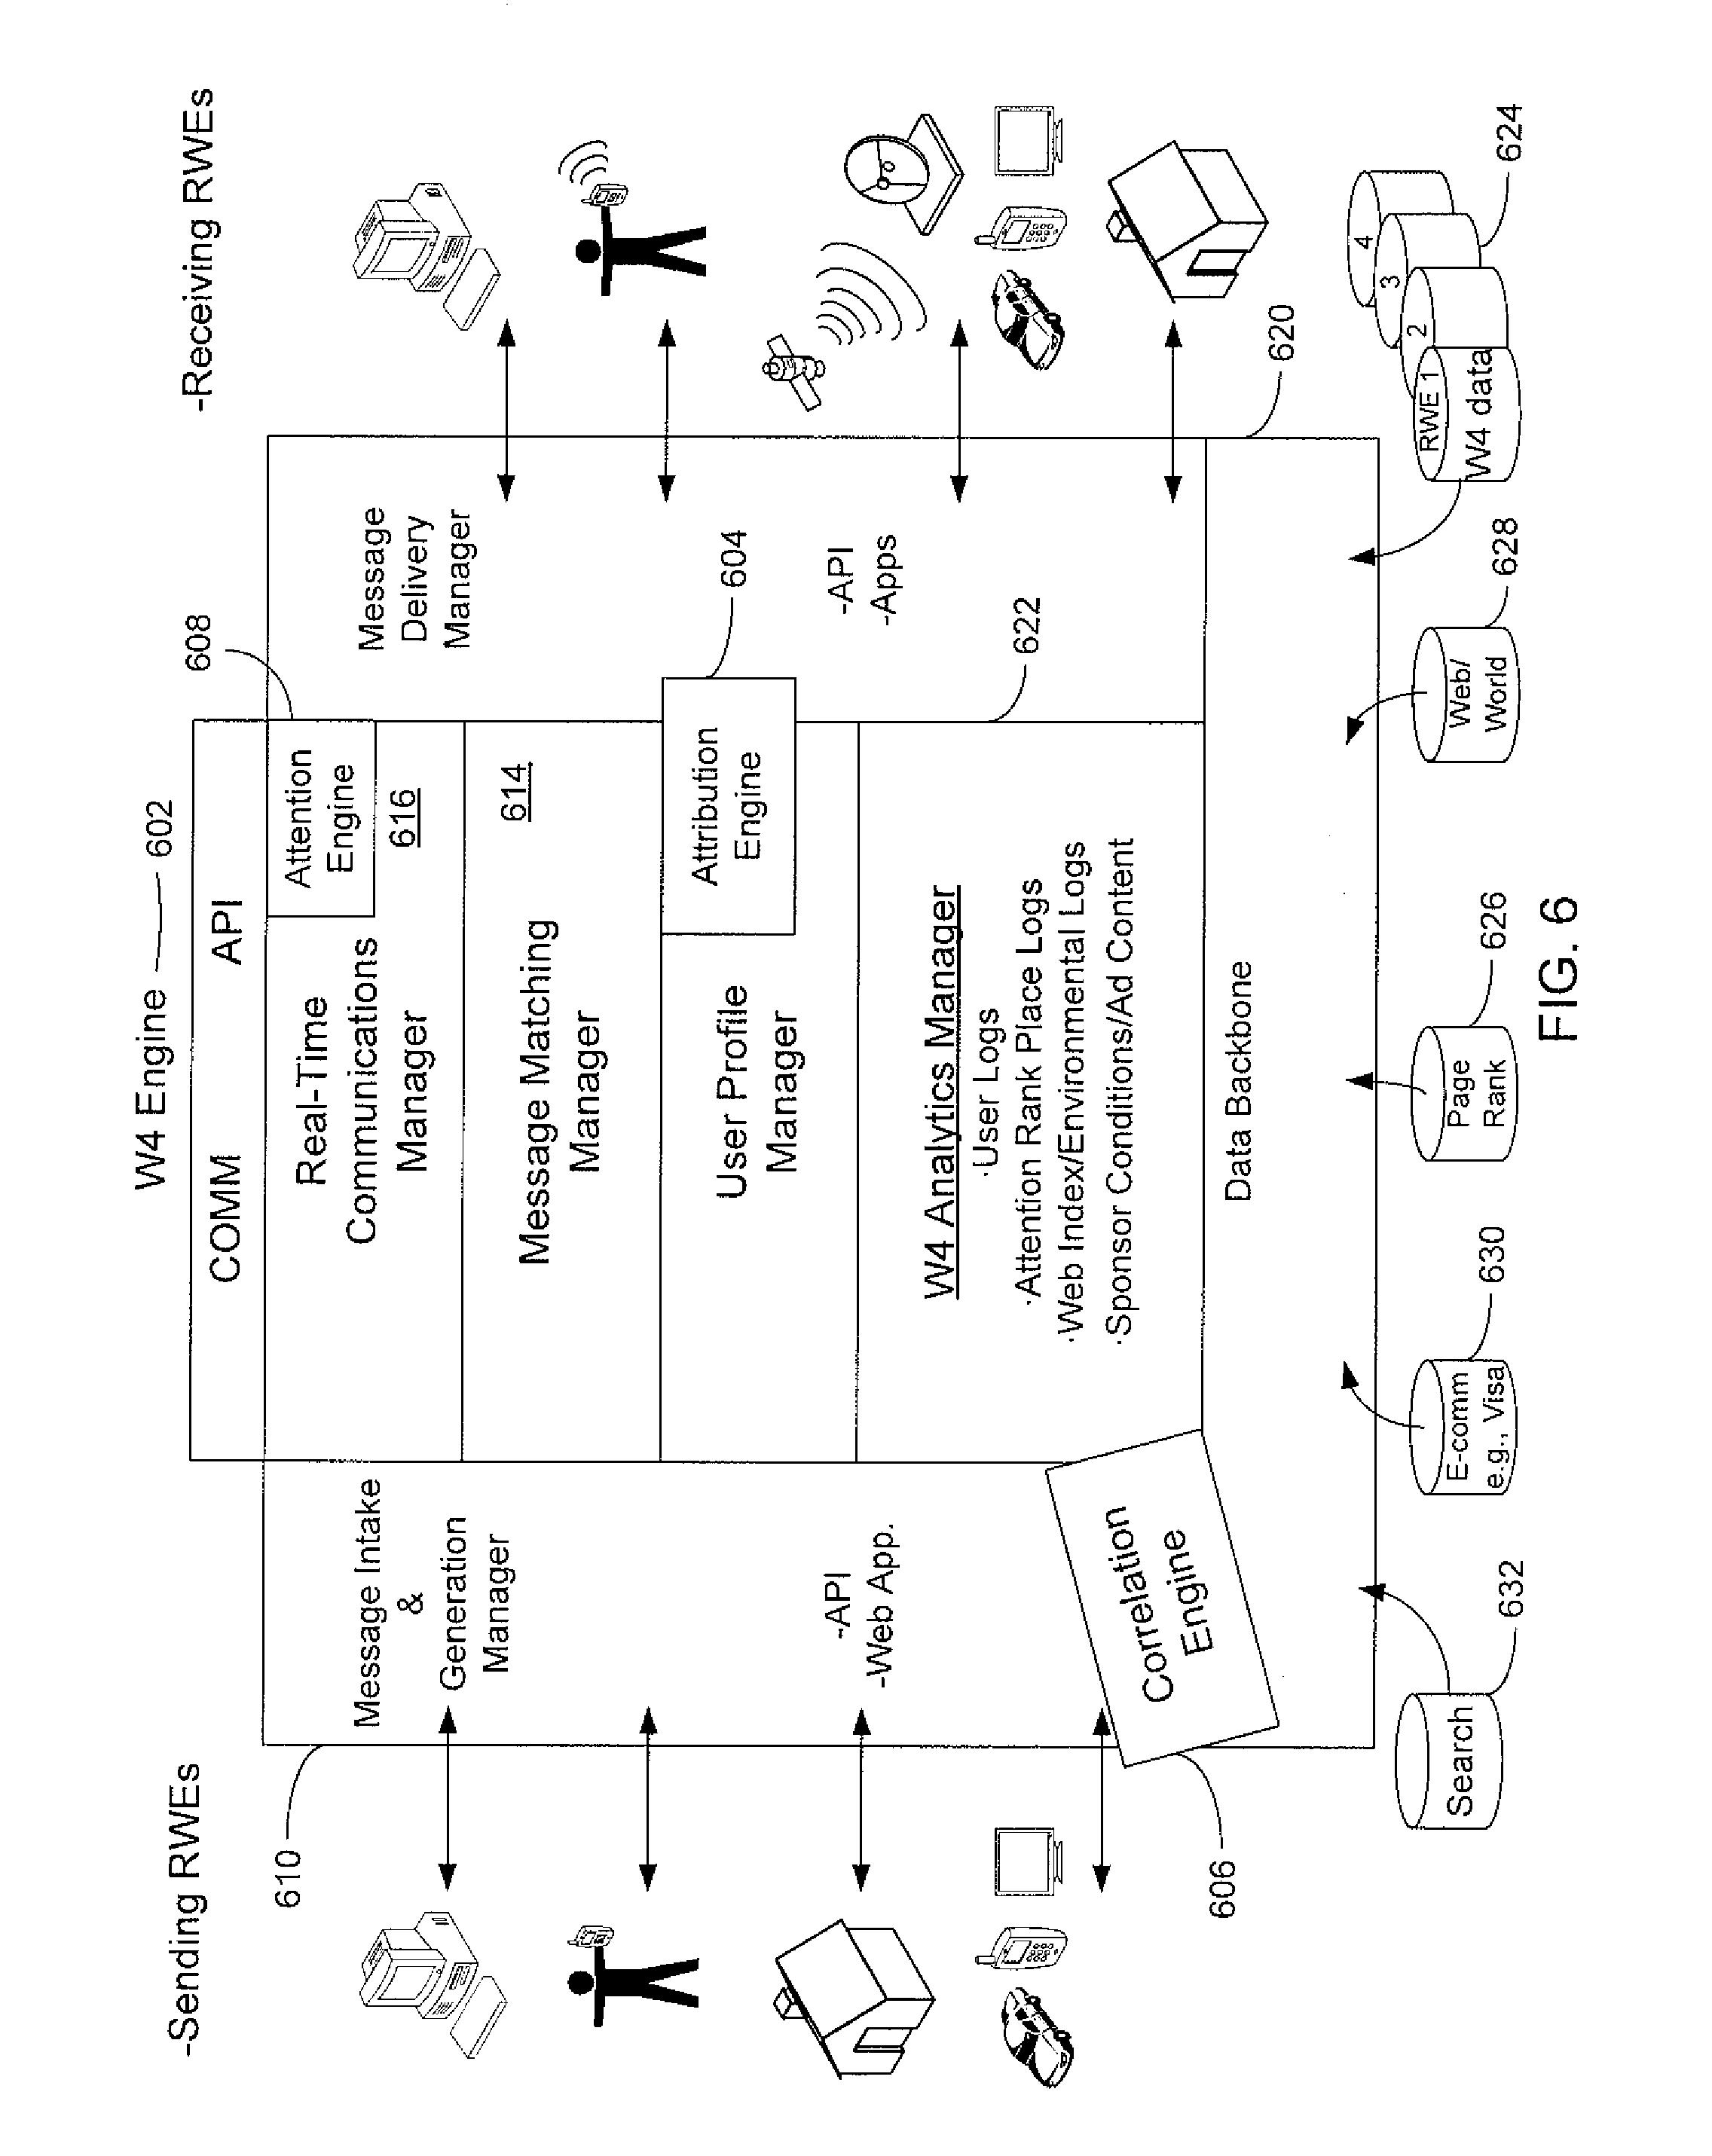 Patent US 8,452,855 B2